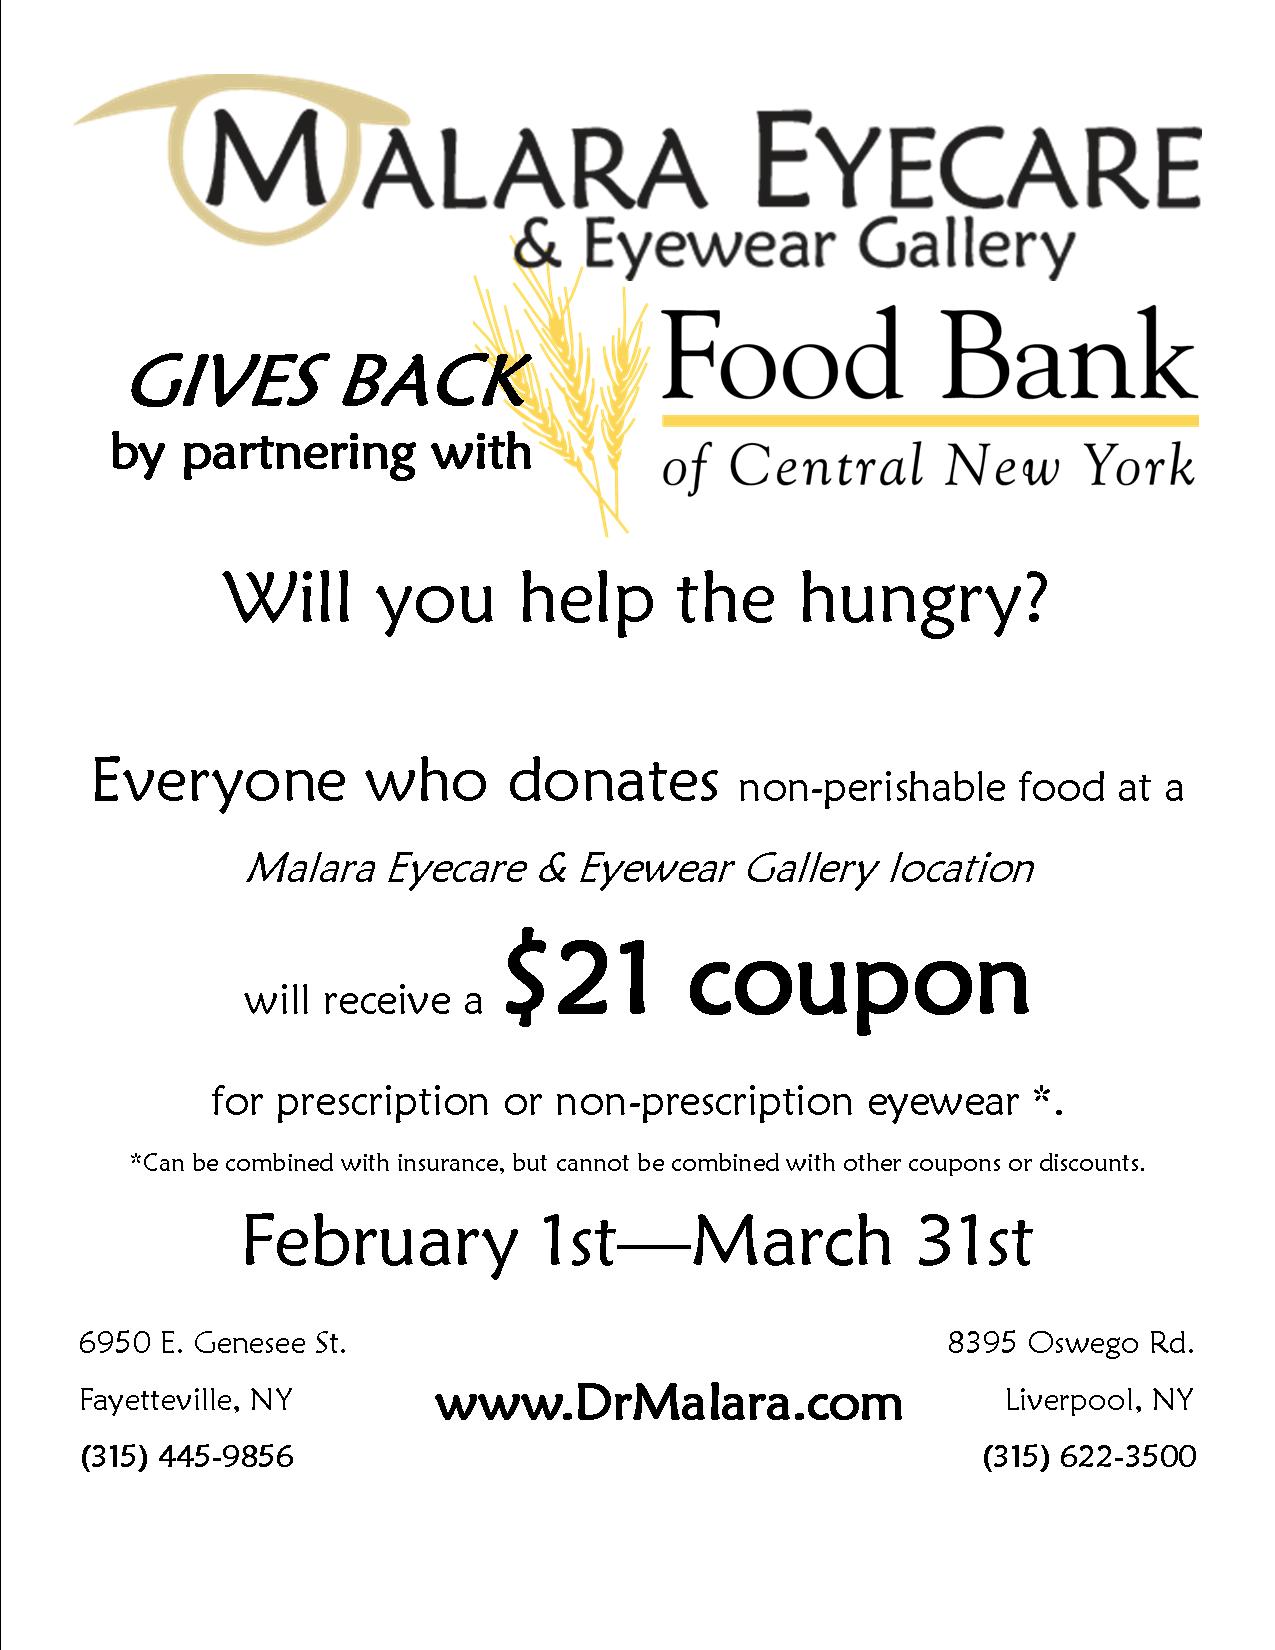 Food bank promotion 2021